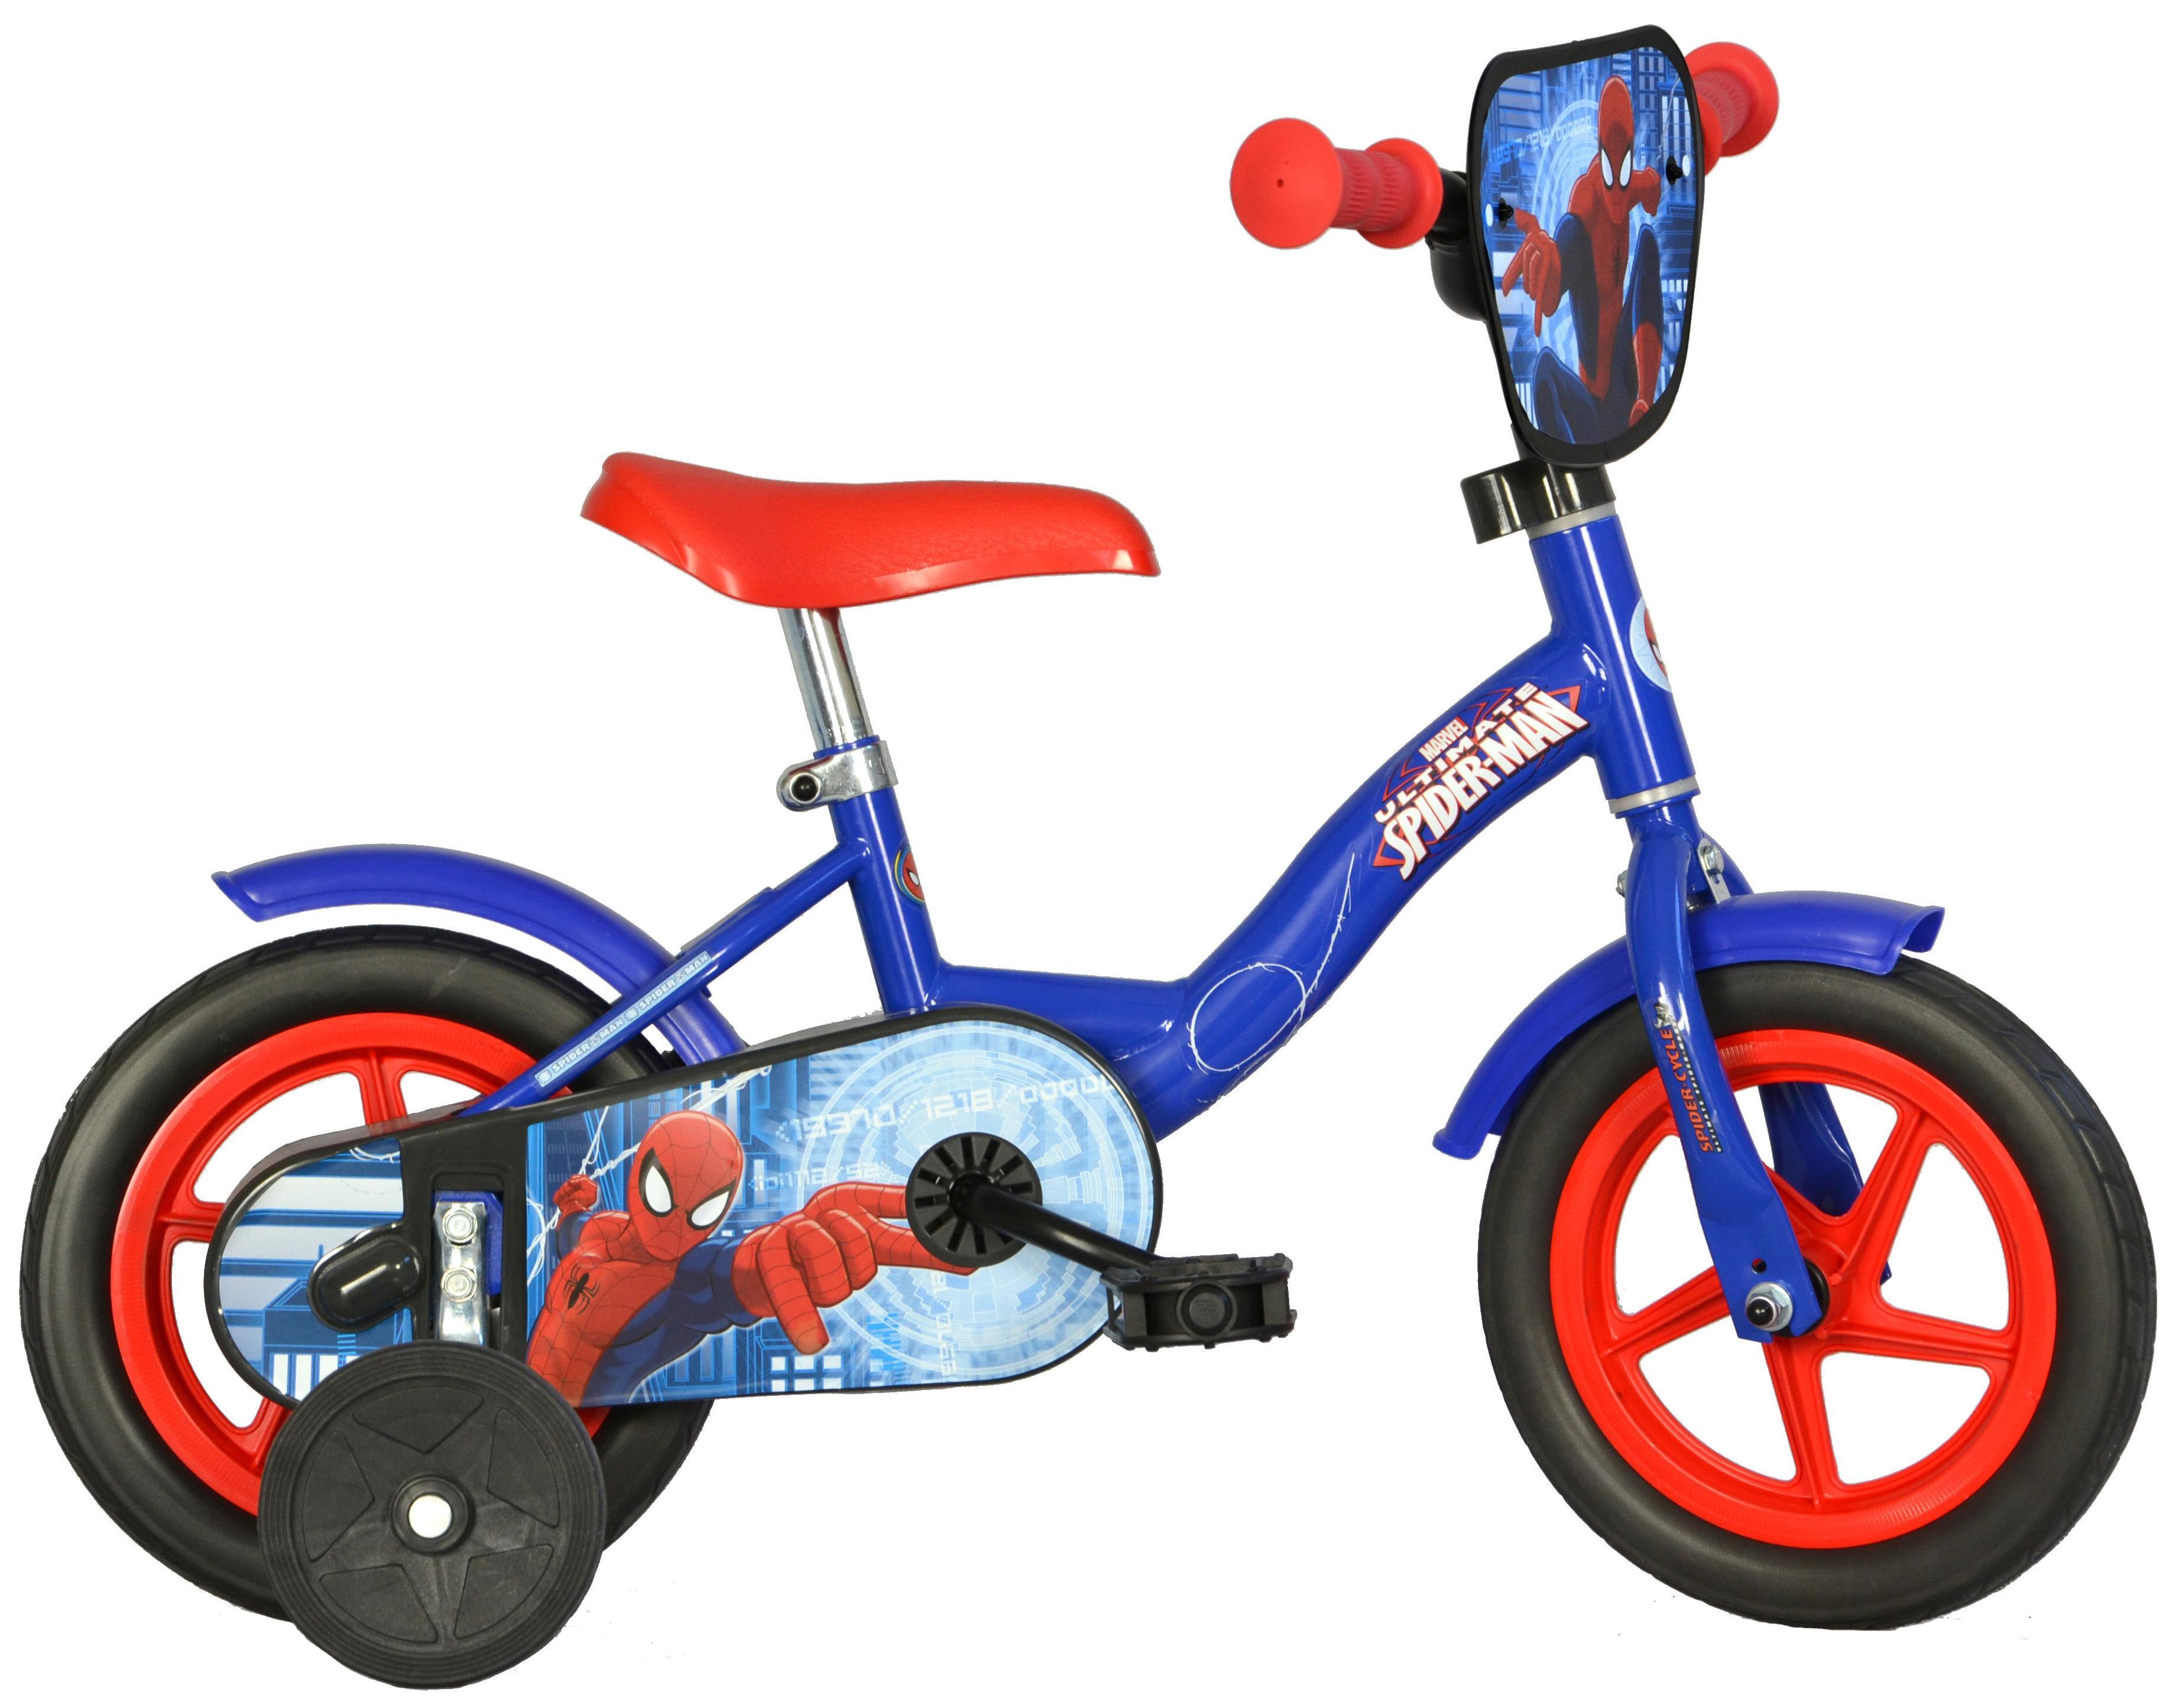 Spiderman Kids Bike - 10 inch Wheel